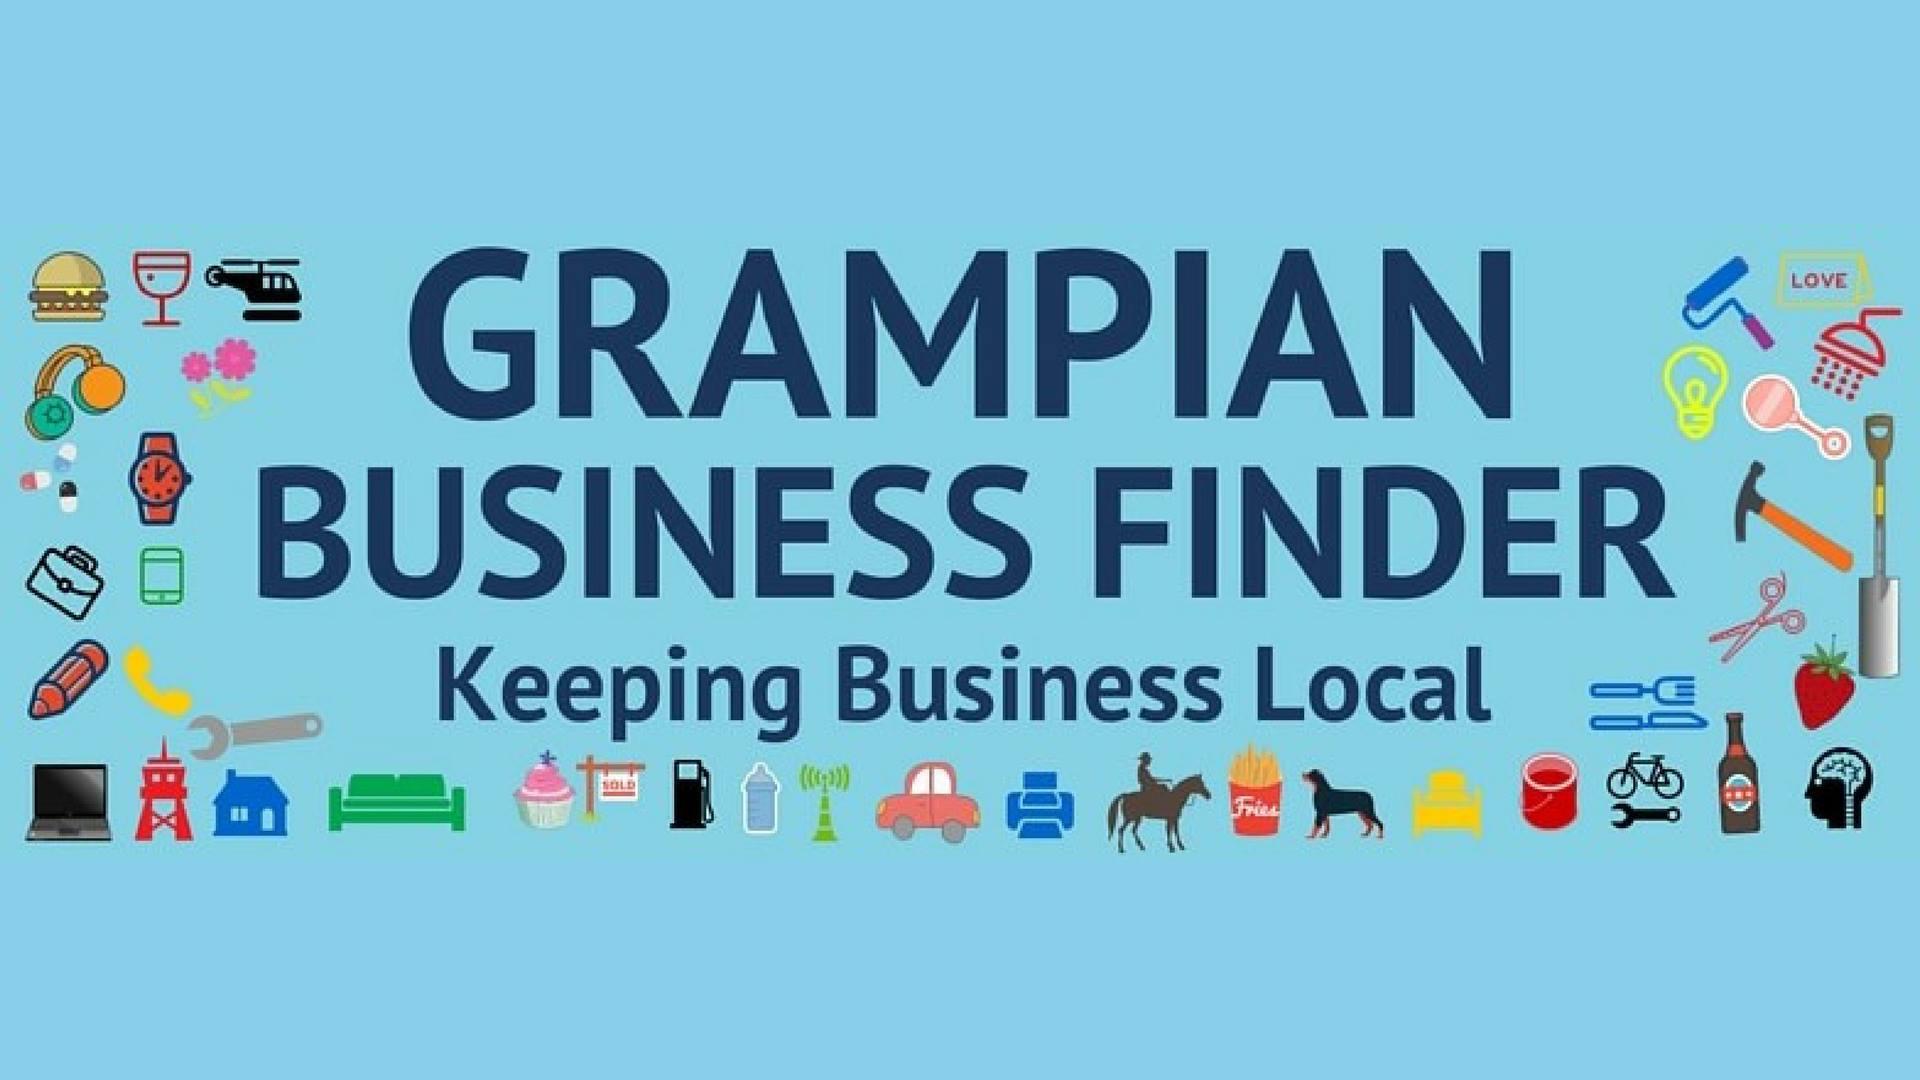 Grampian Business Finder Facebook